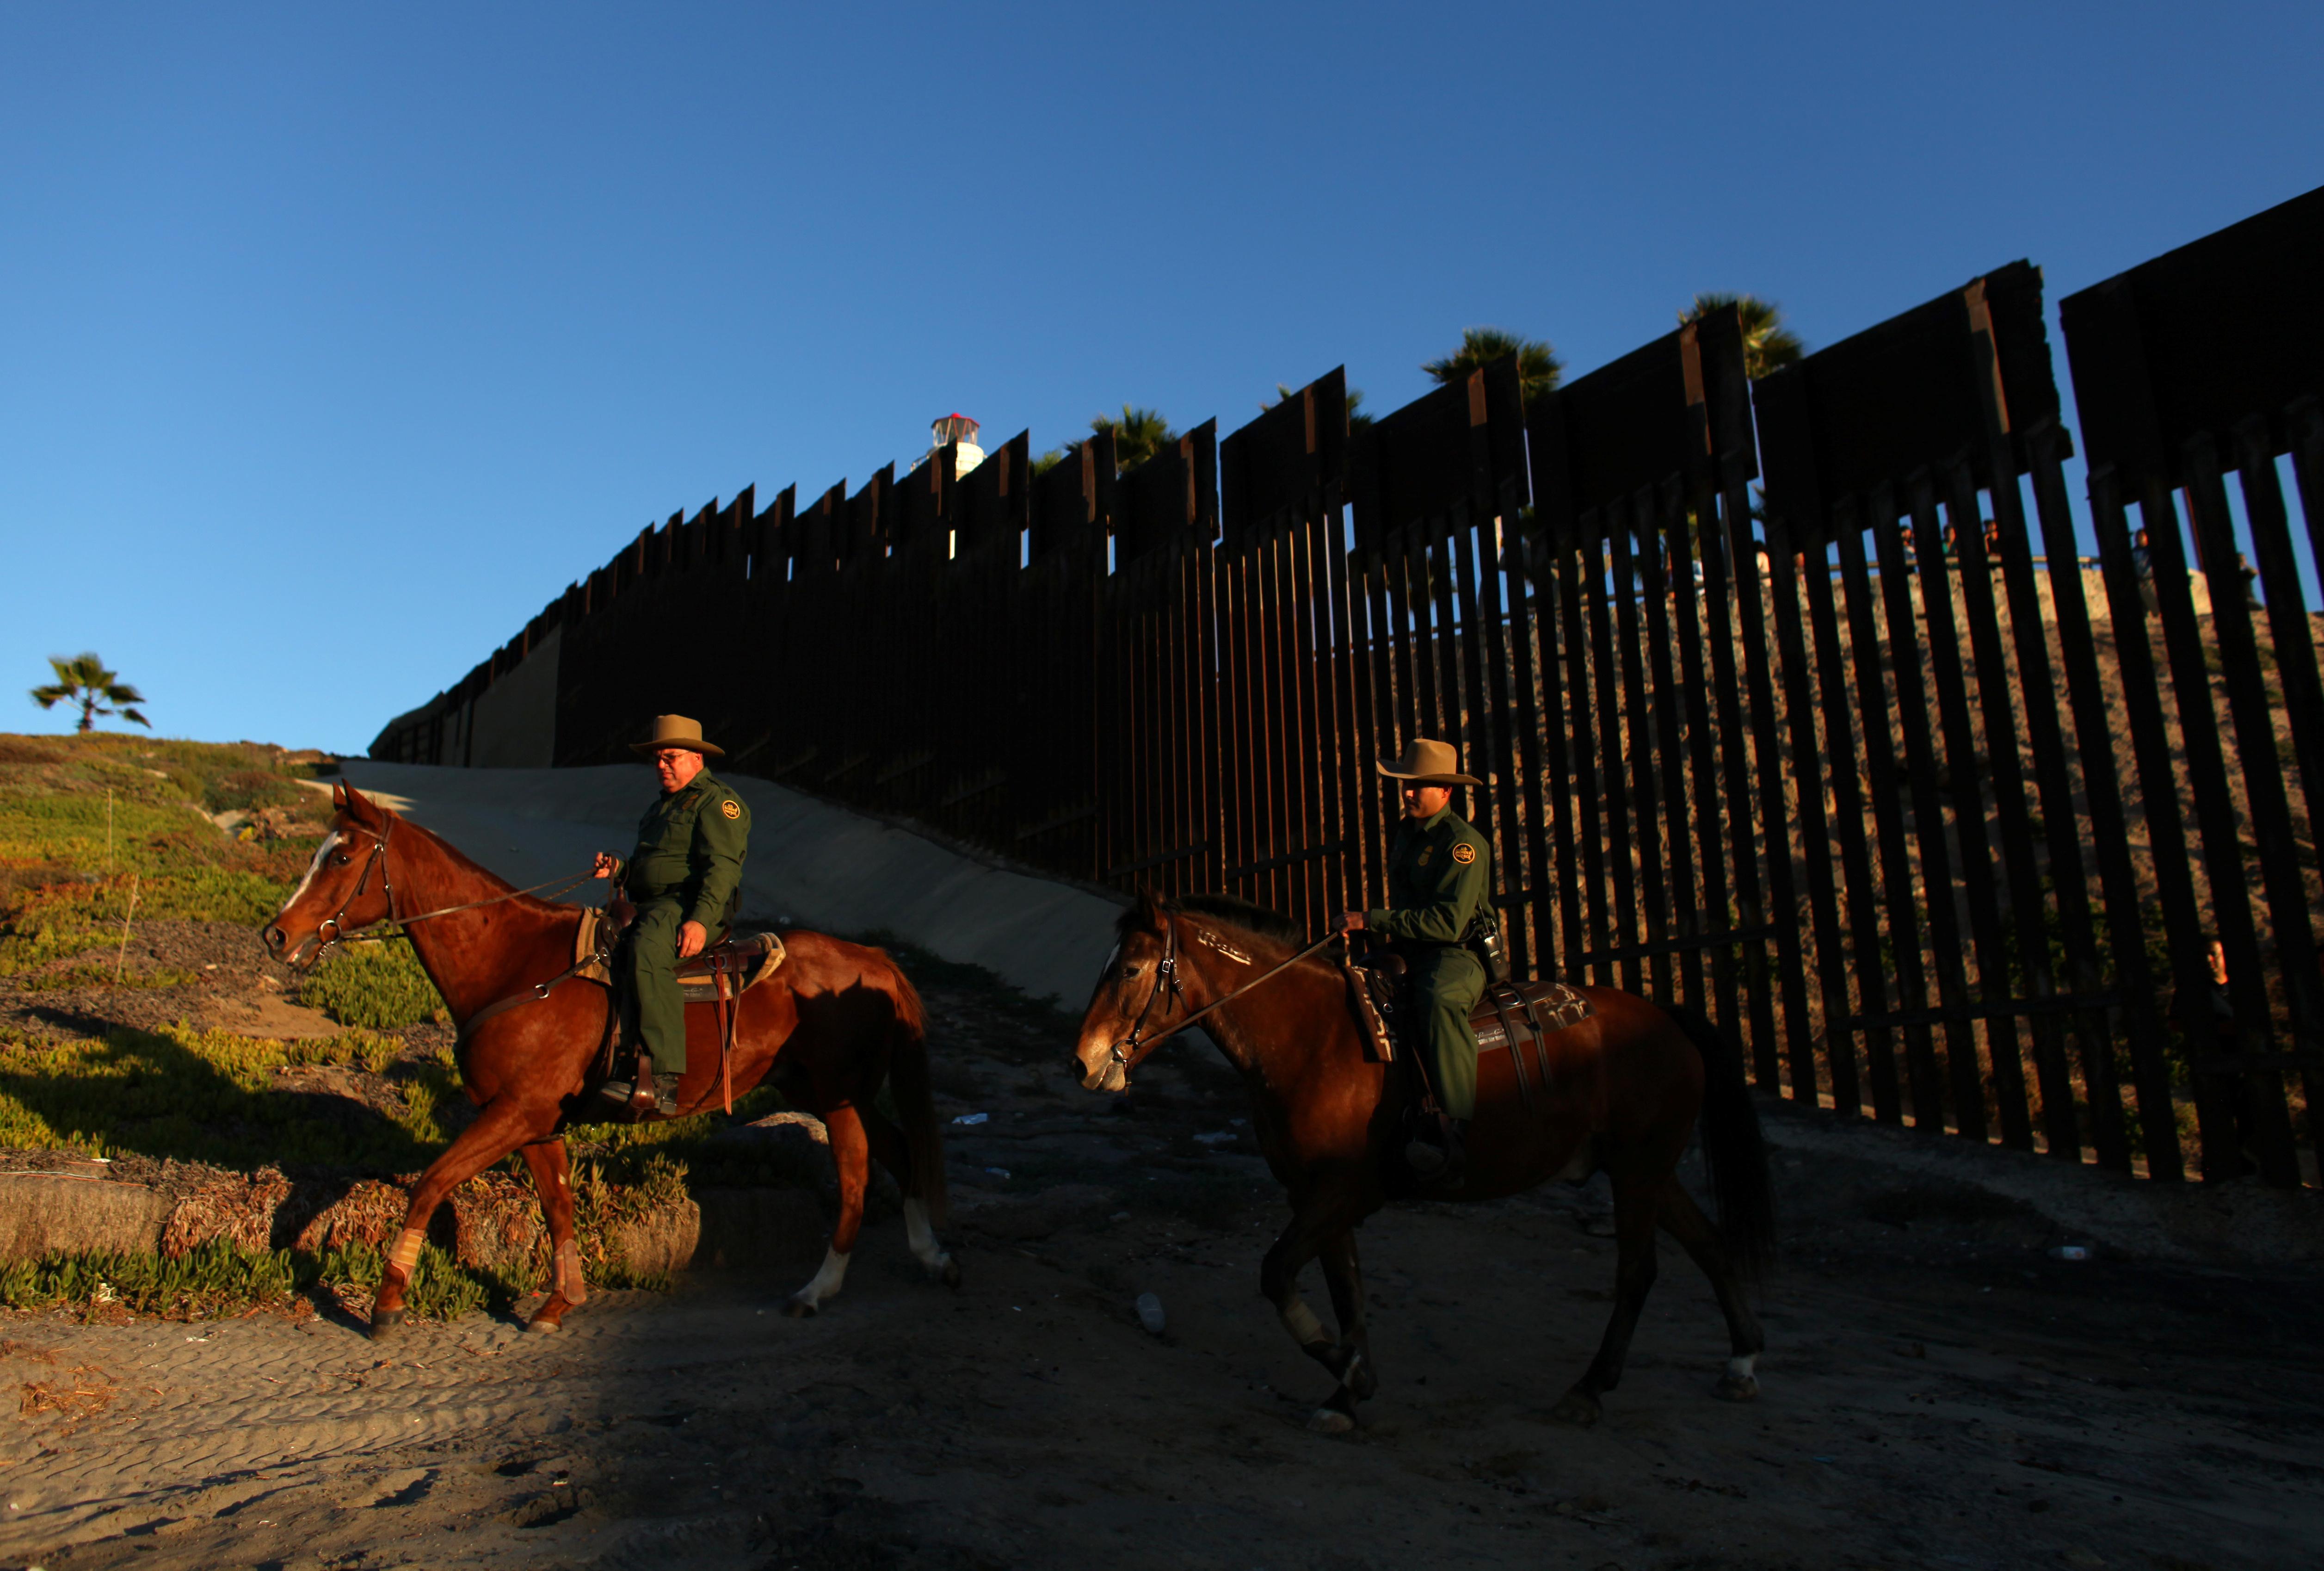 File Photo: U.S. border patrol agents on horseback patrol along the U.S. Mexico border fence near San Diego, California